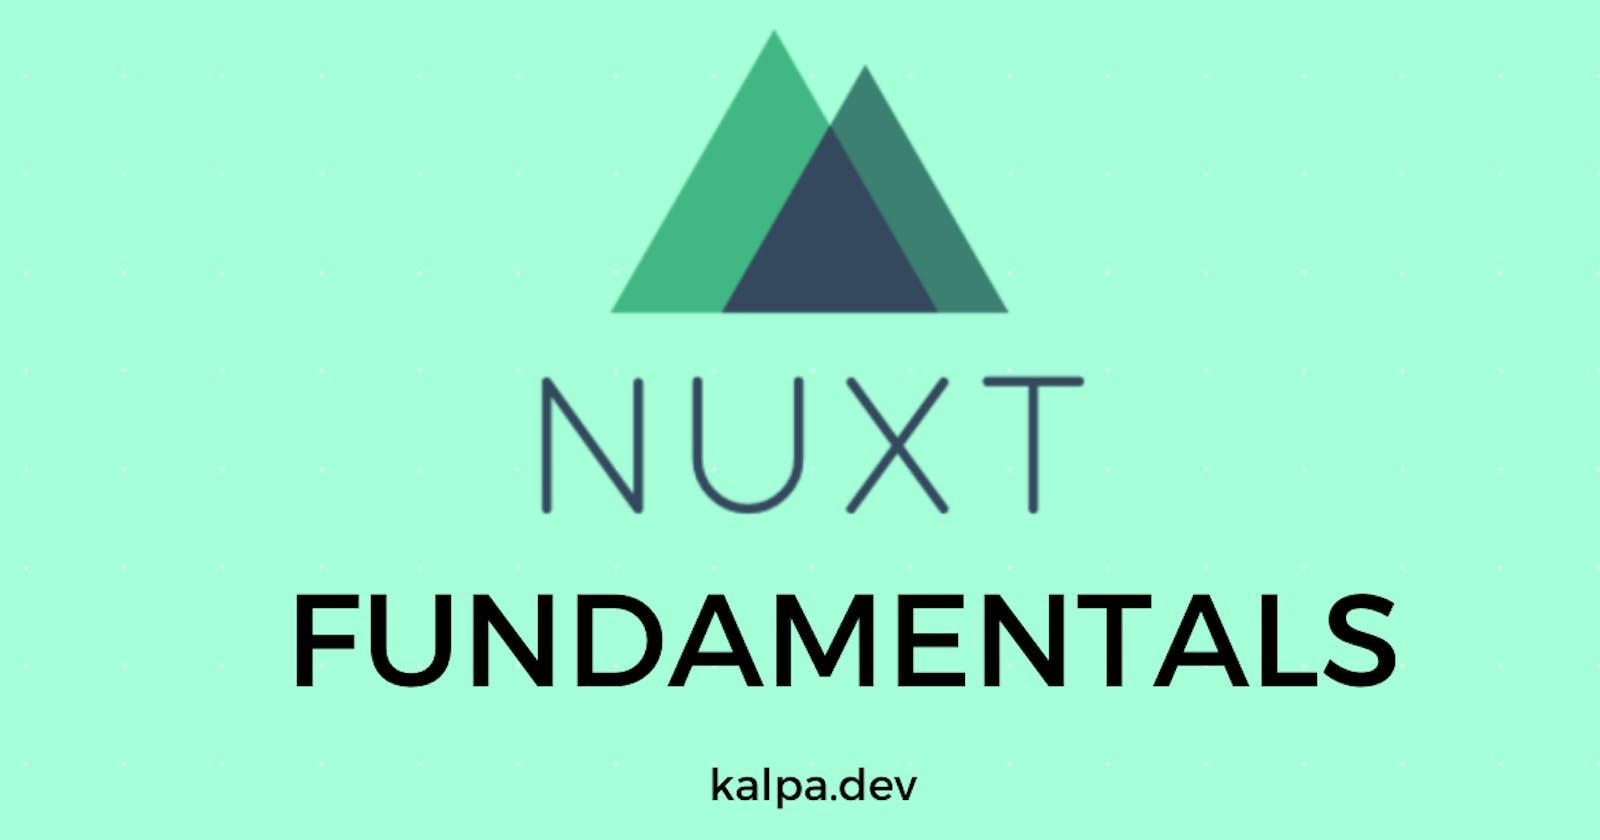 Nuxtjs Fundamentals: Introduction